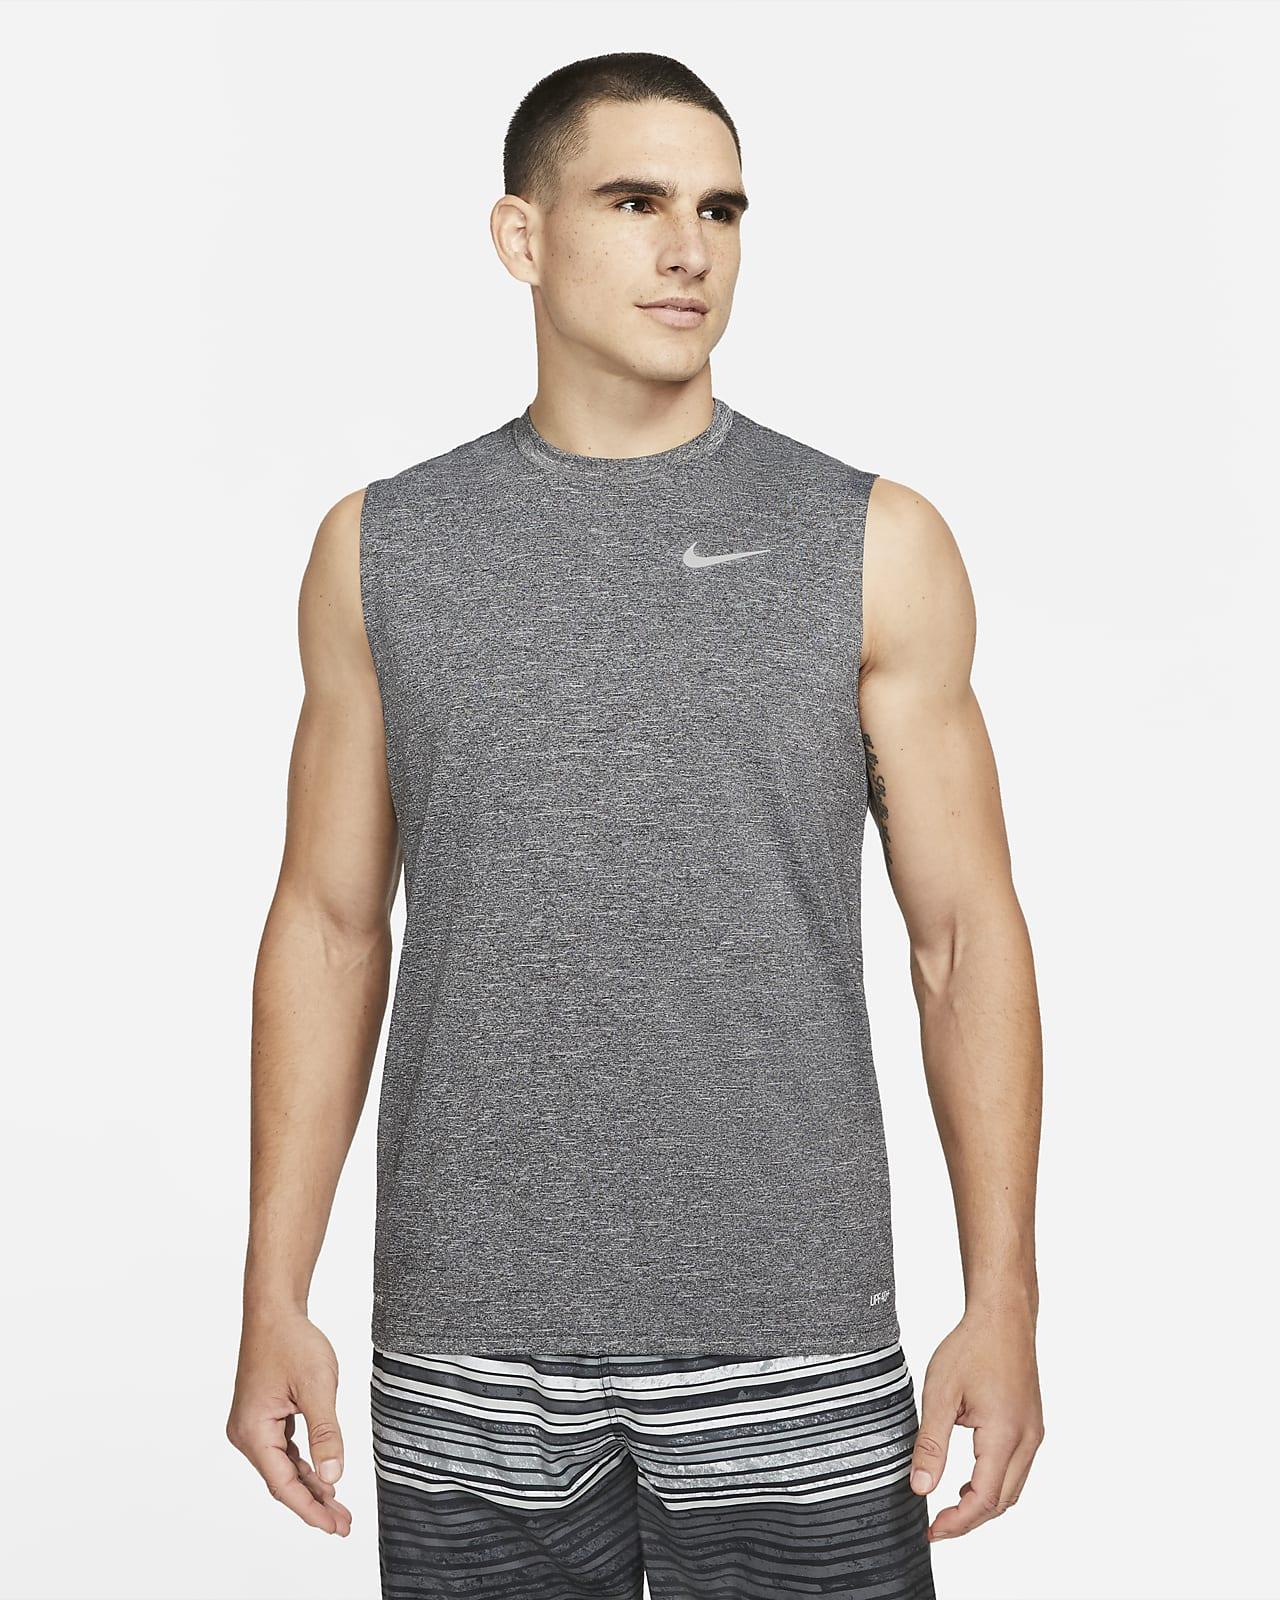 Nike Men's Heathered Sleeveless Hydroguard Swim Shirt